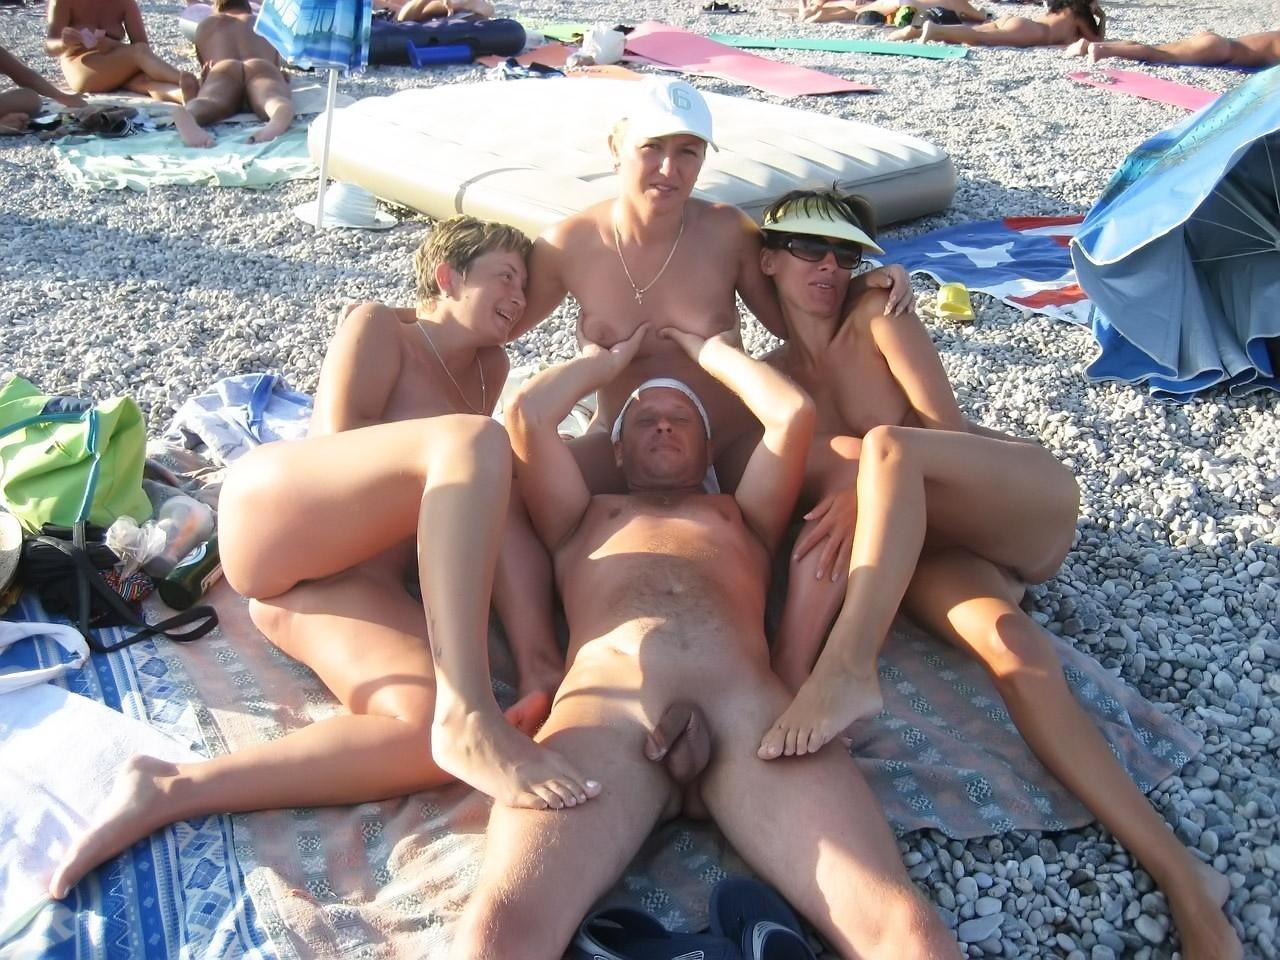 russkiy-nudistskiy-plyazh